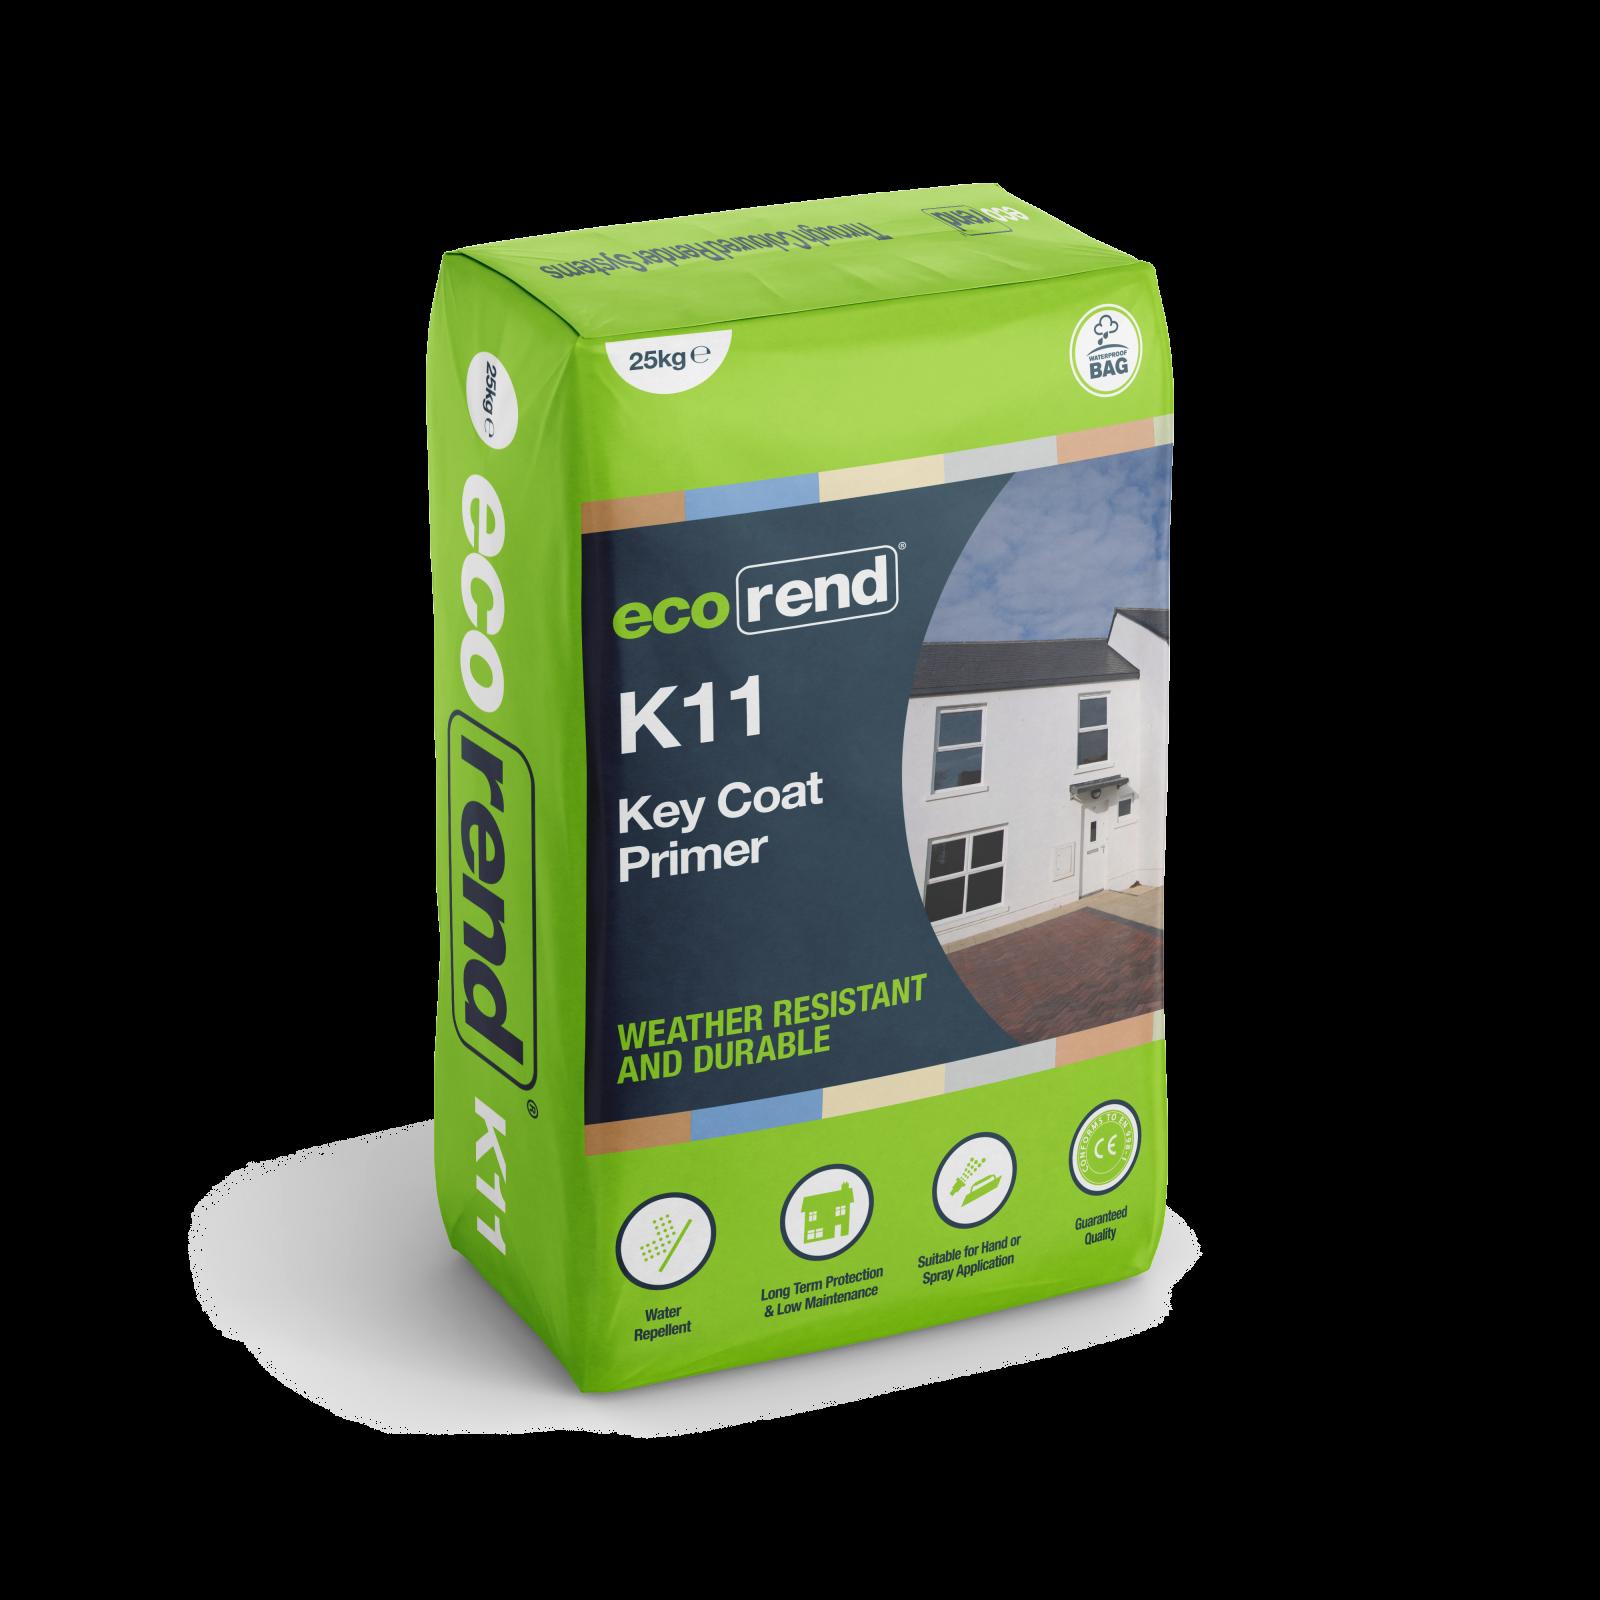 K11 – Key Coat Primer Ultra High Polymer